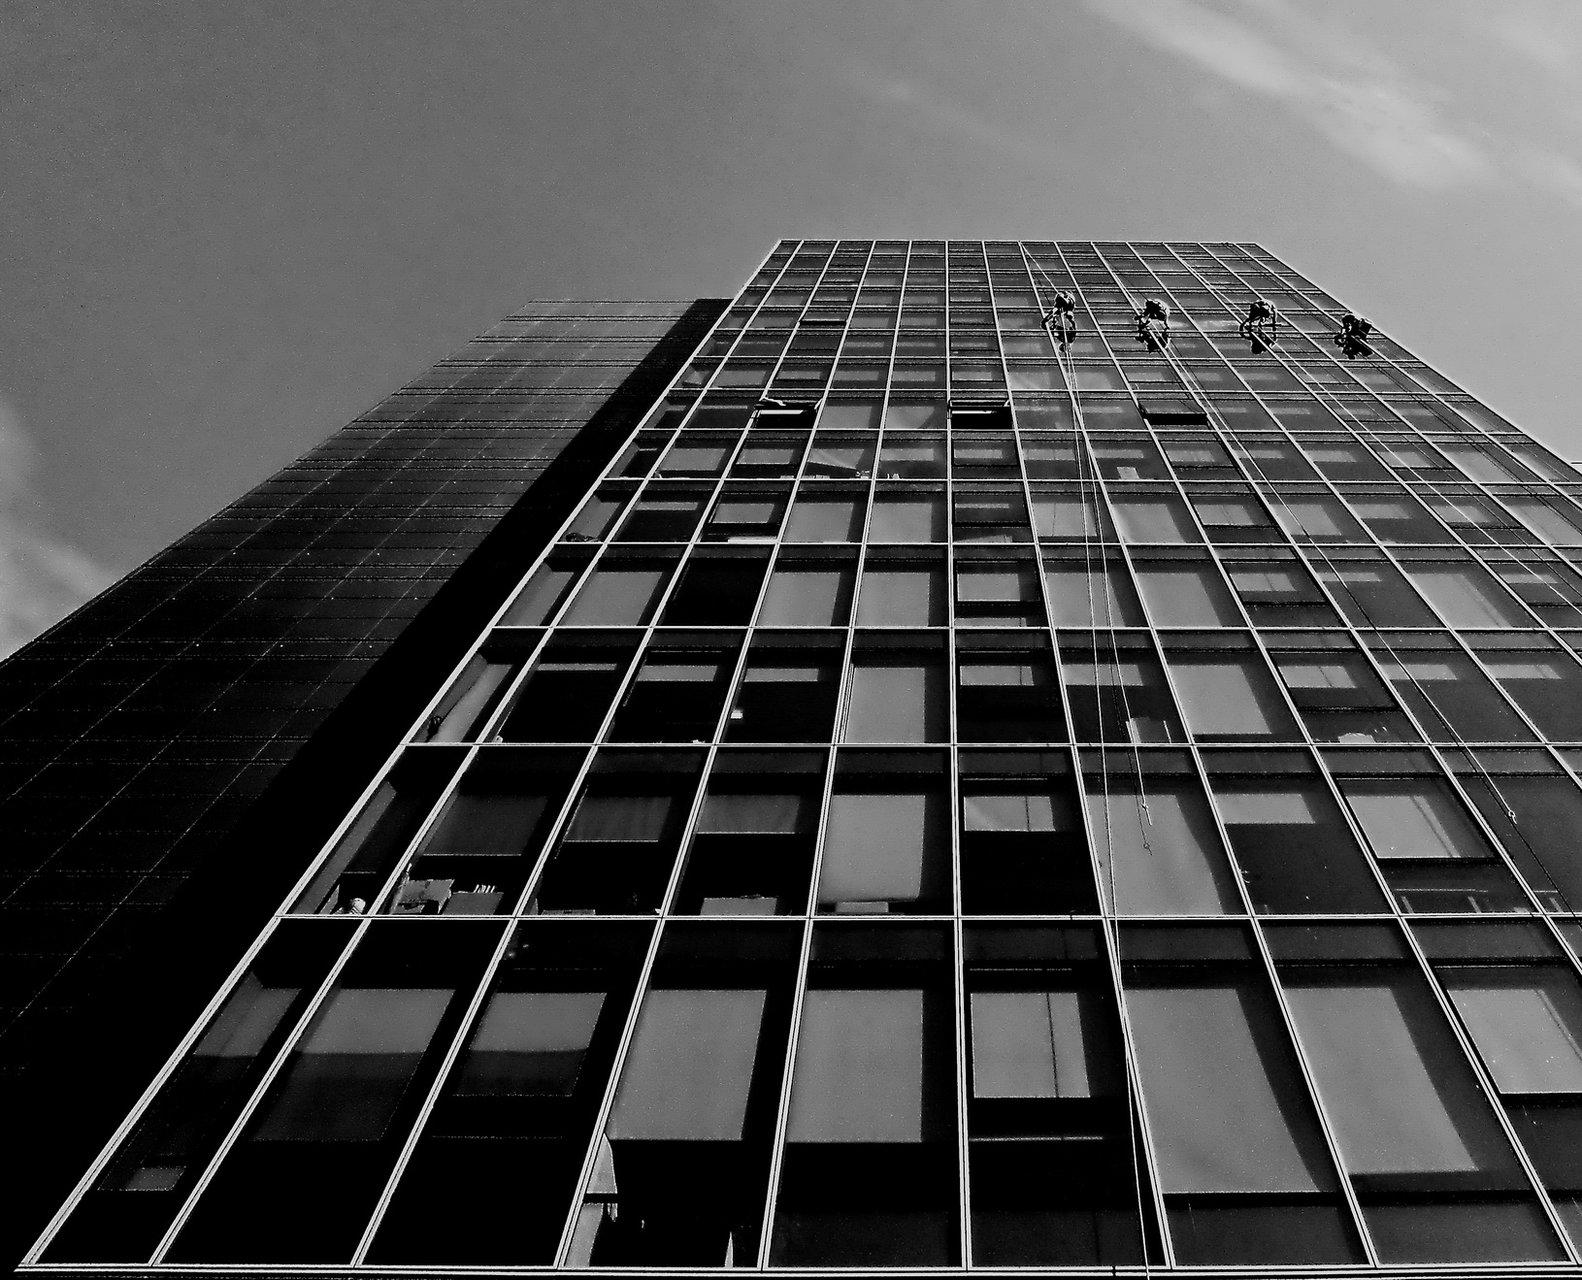 Нагоре,нагоре,нагоре... | Author Dobromir Neykov - Dobnej | PHOTO FORUM